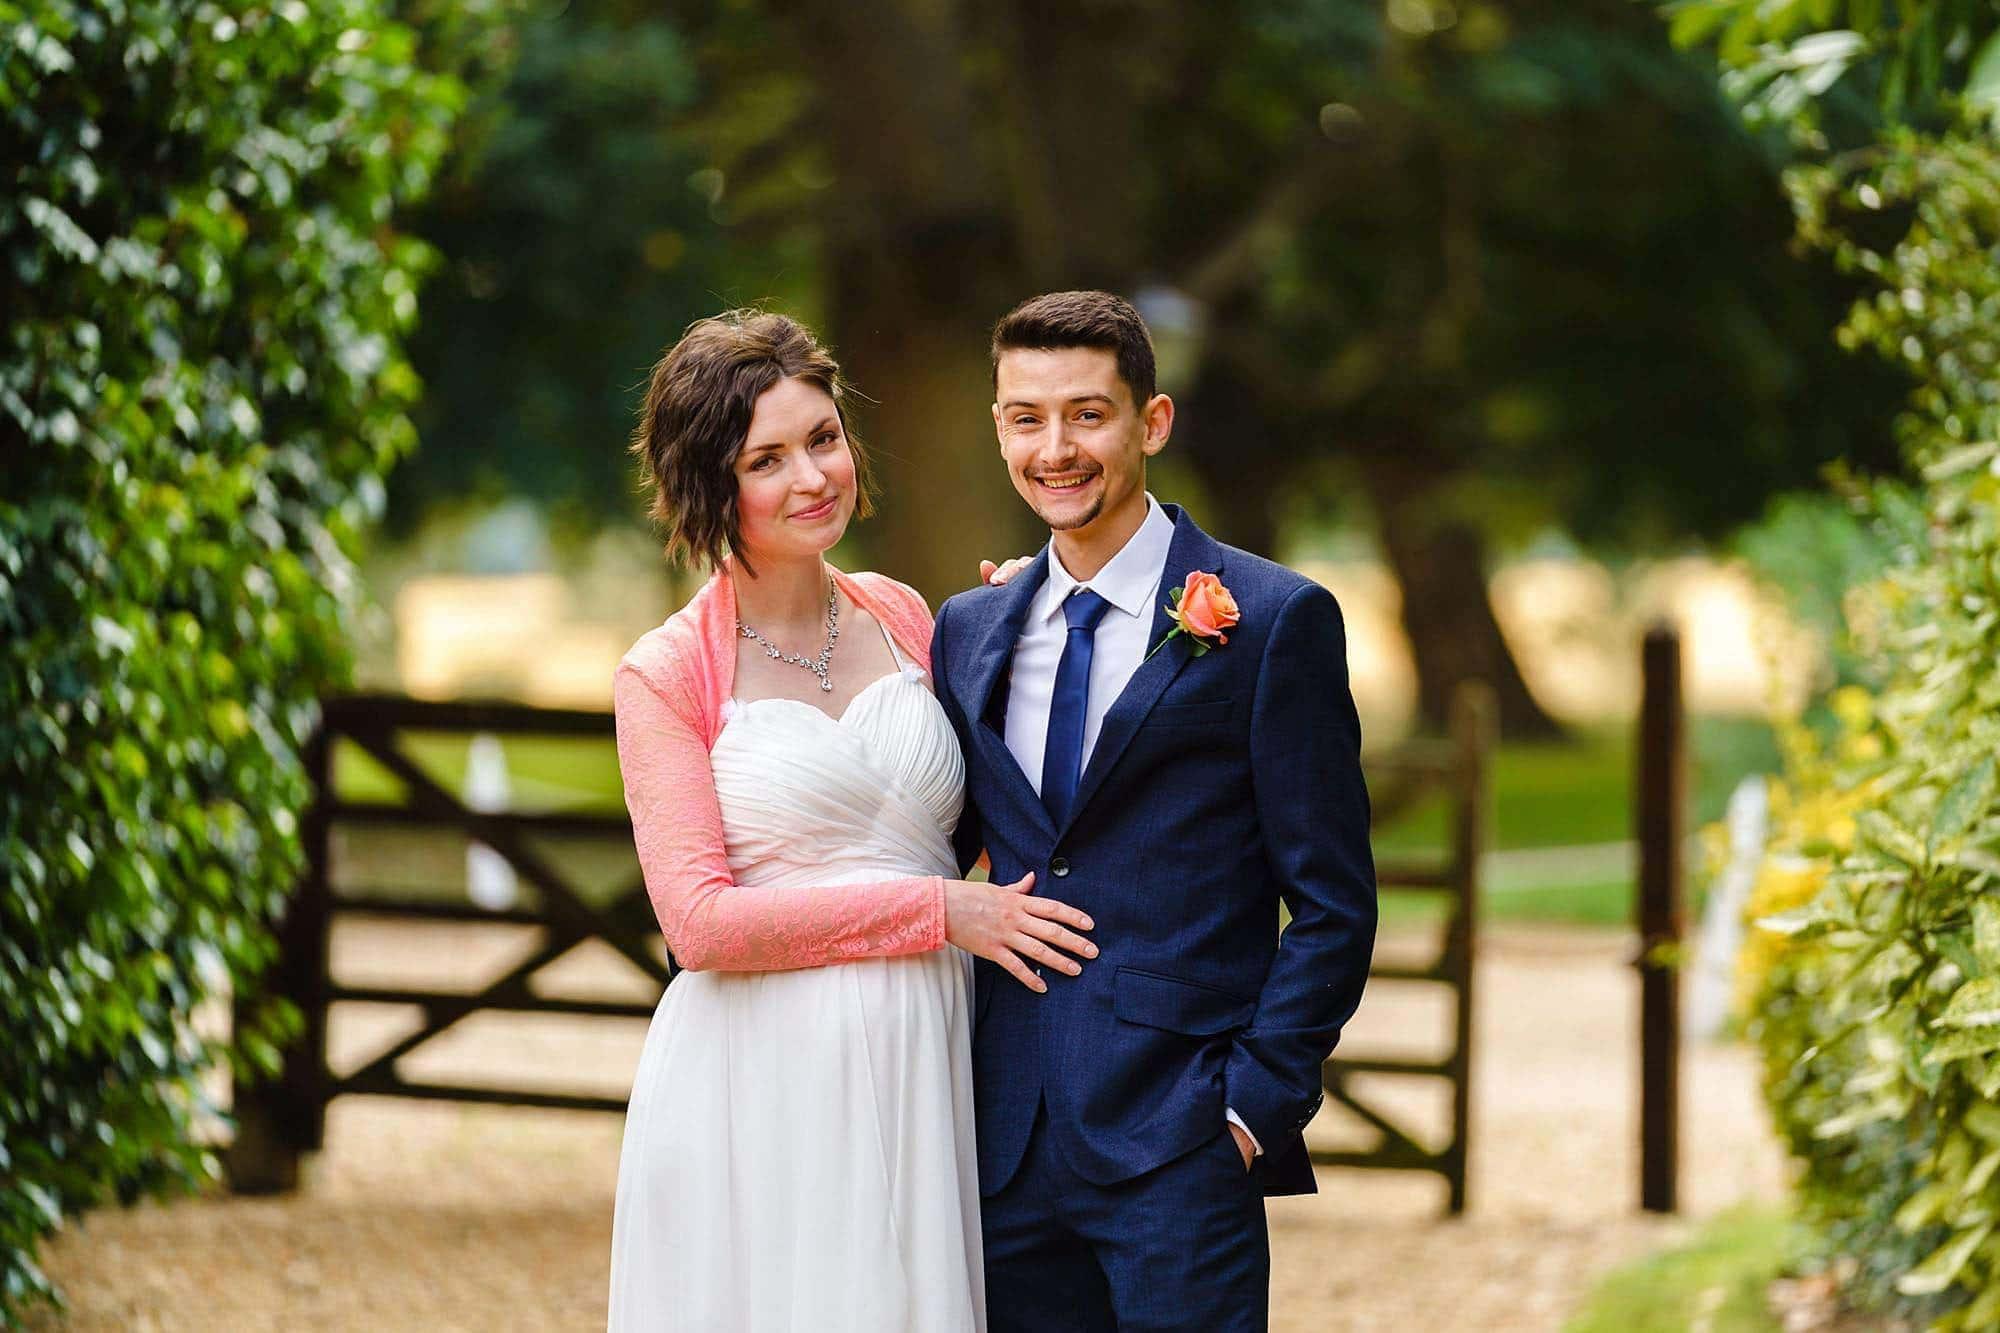 Hintlesham elopement